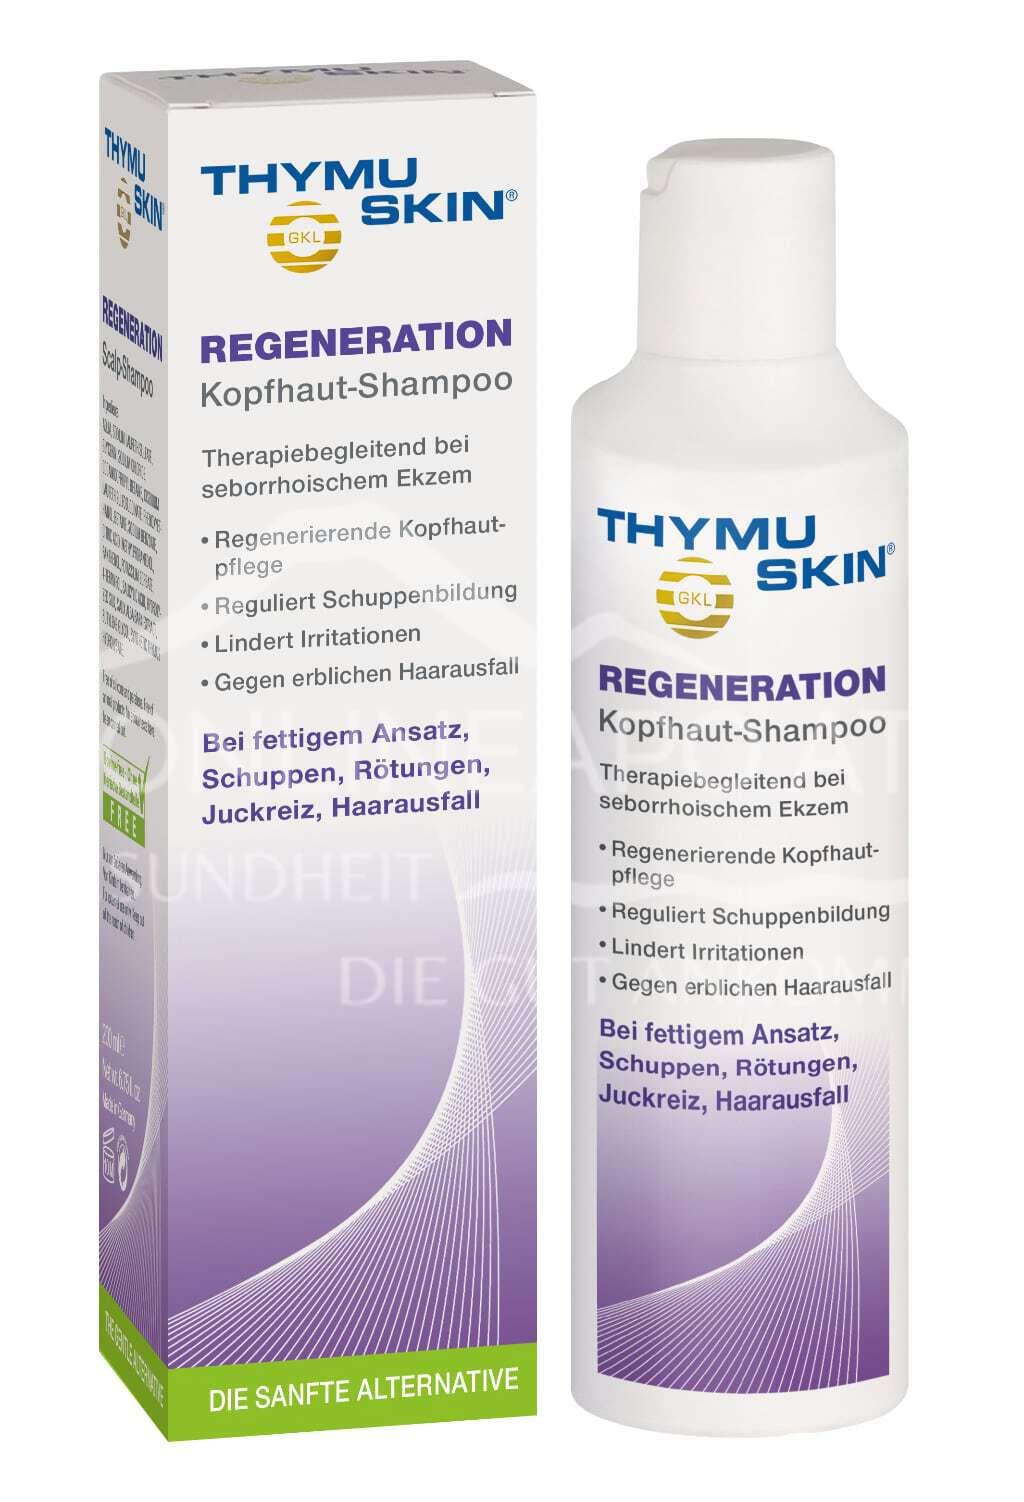 Thymuskin Regeneration Kopfhaut-Shampoo